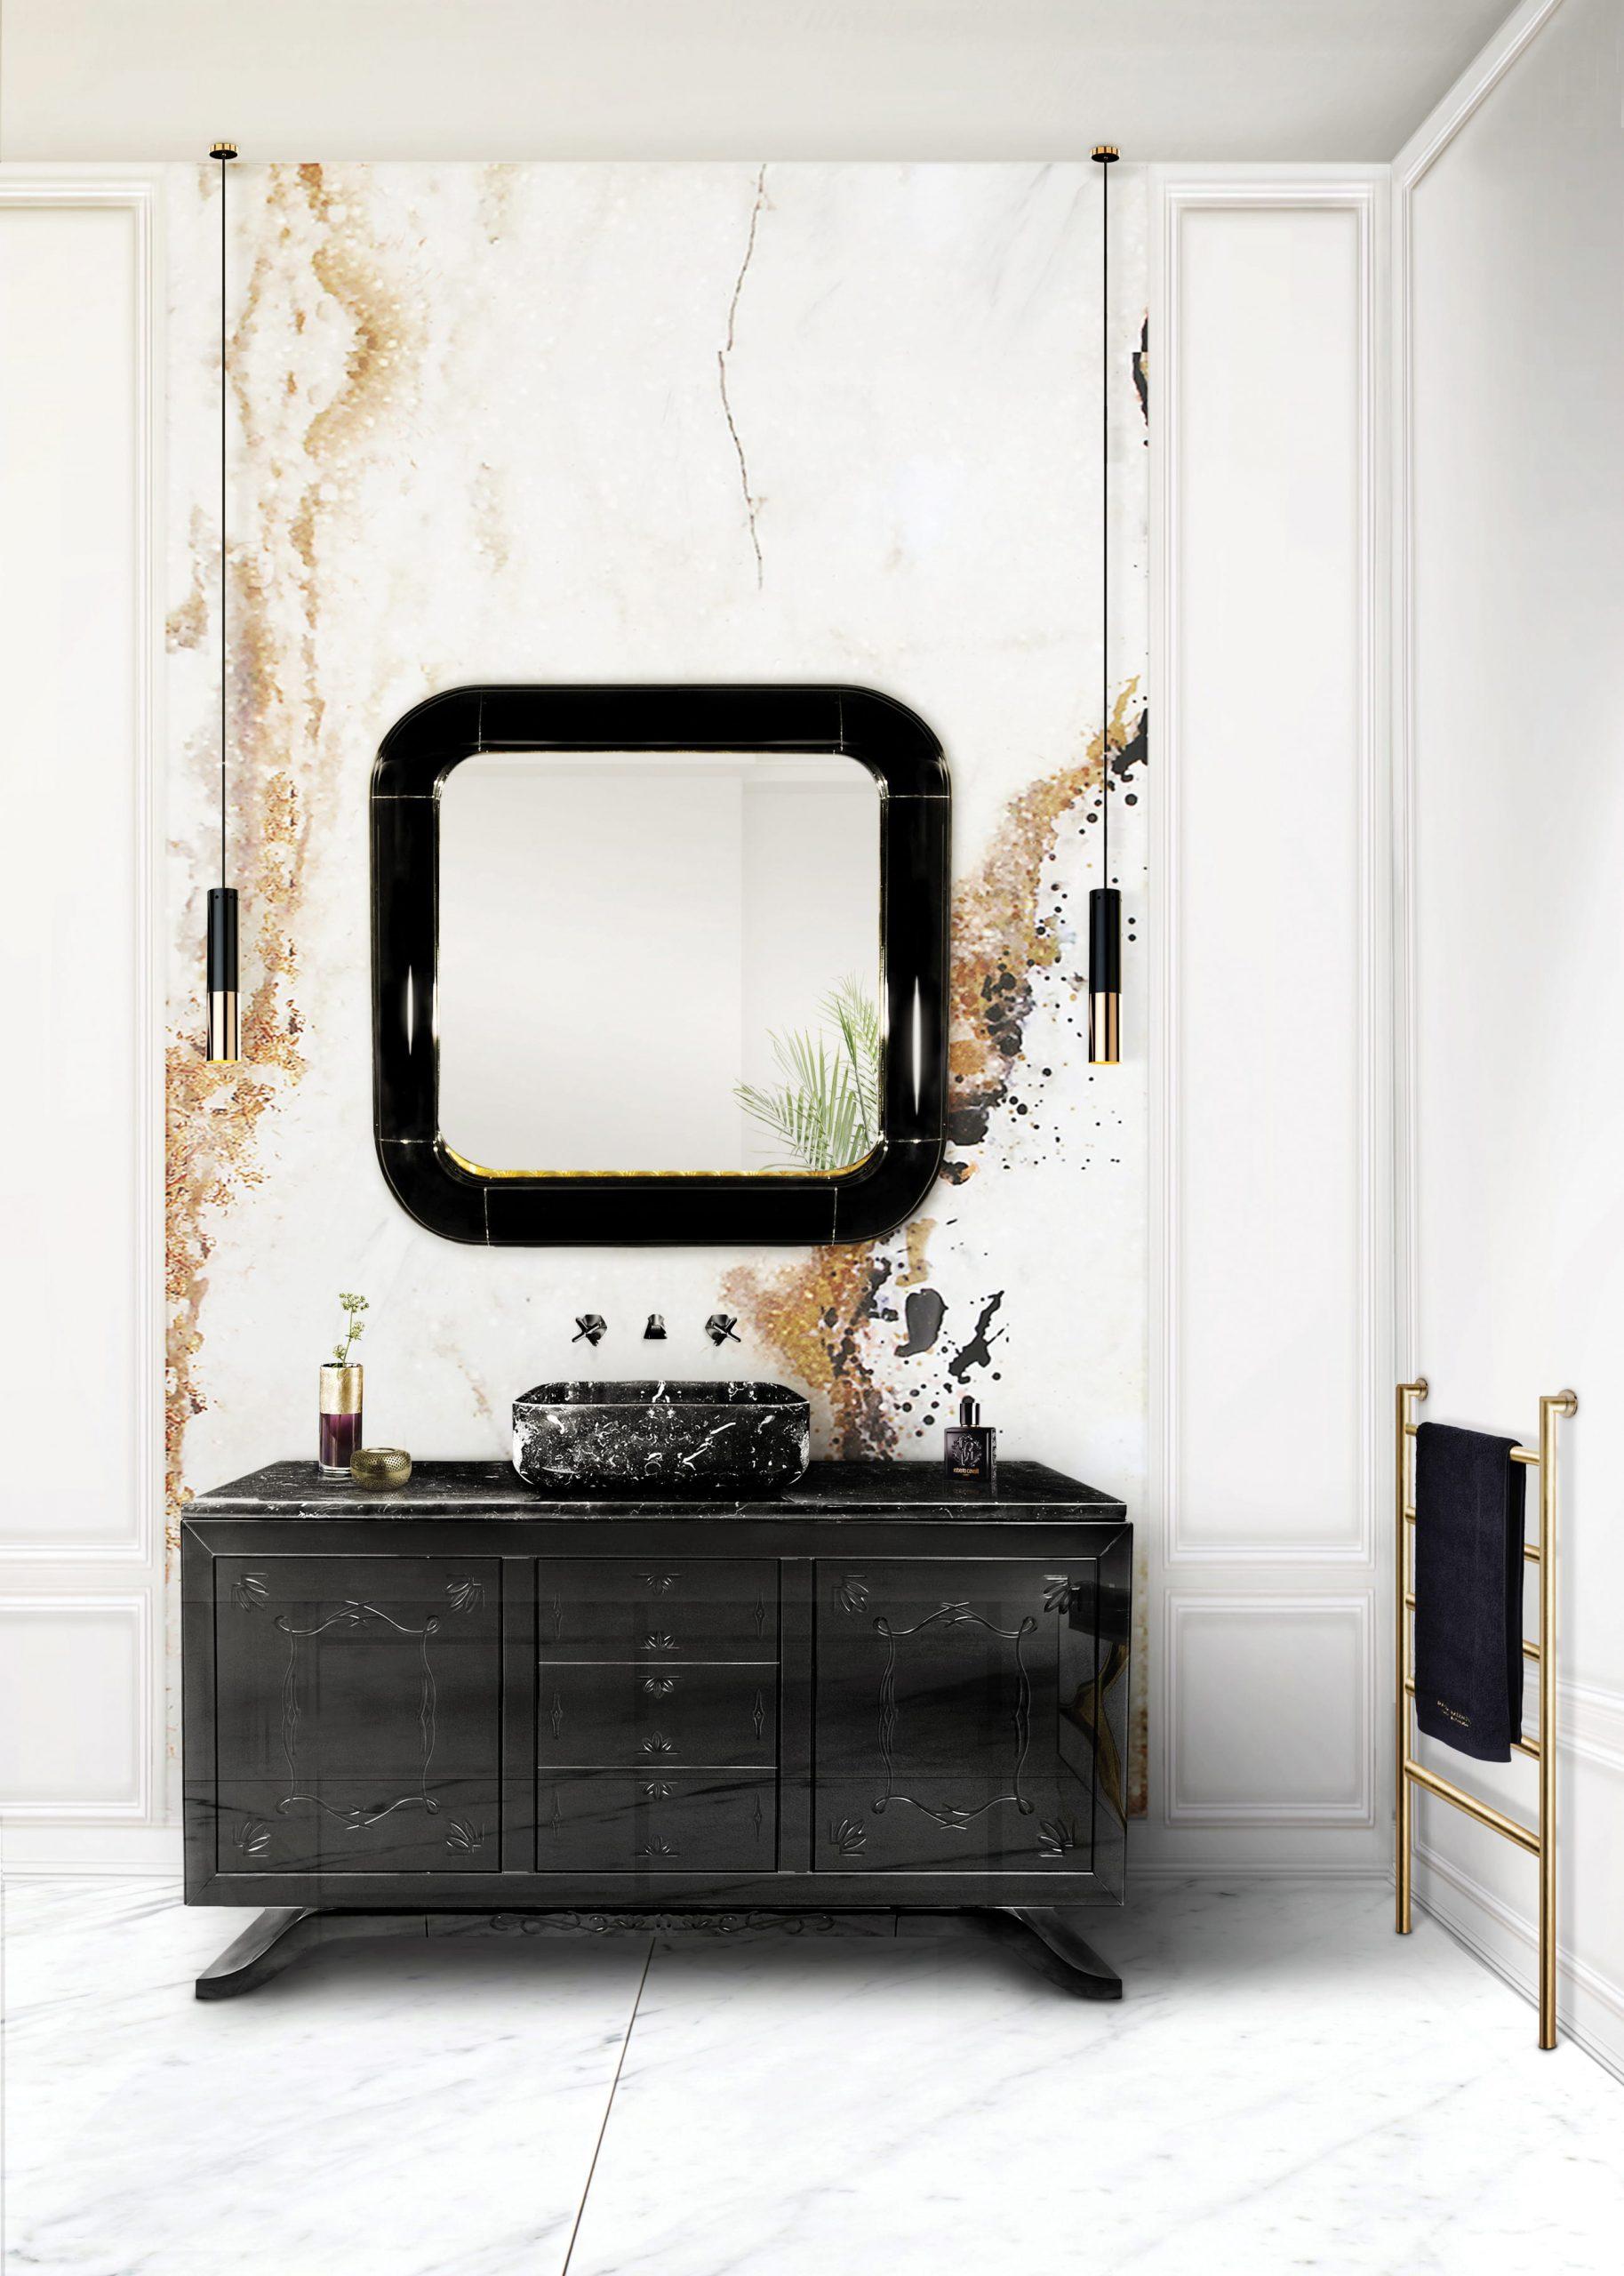 metropolitan_washbasin_insplosion_sblack-marble-bathroom